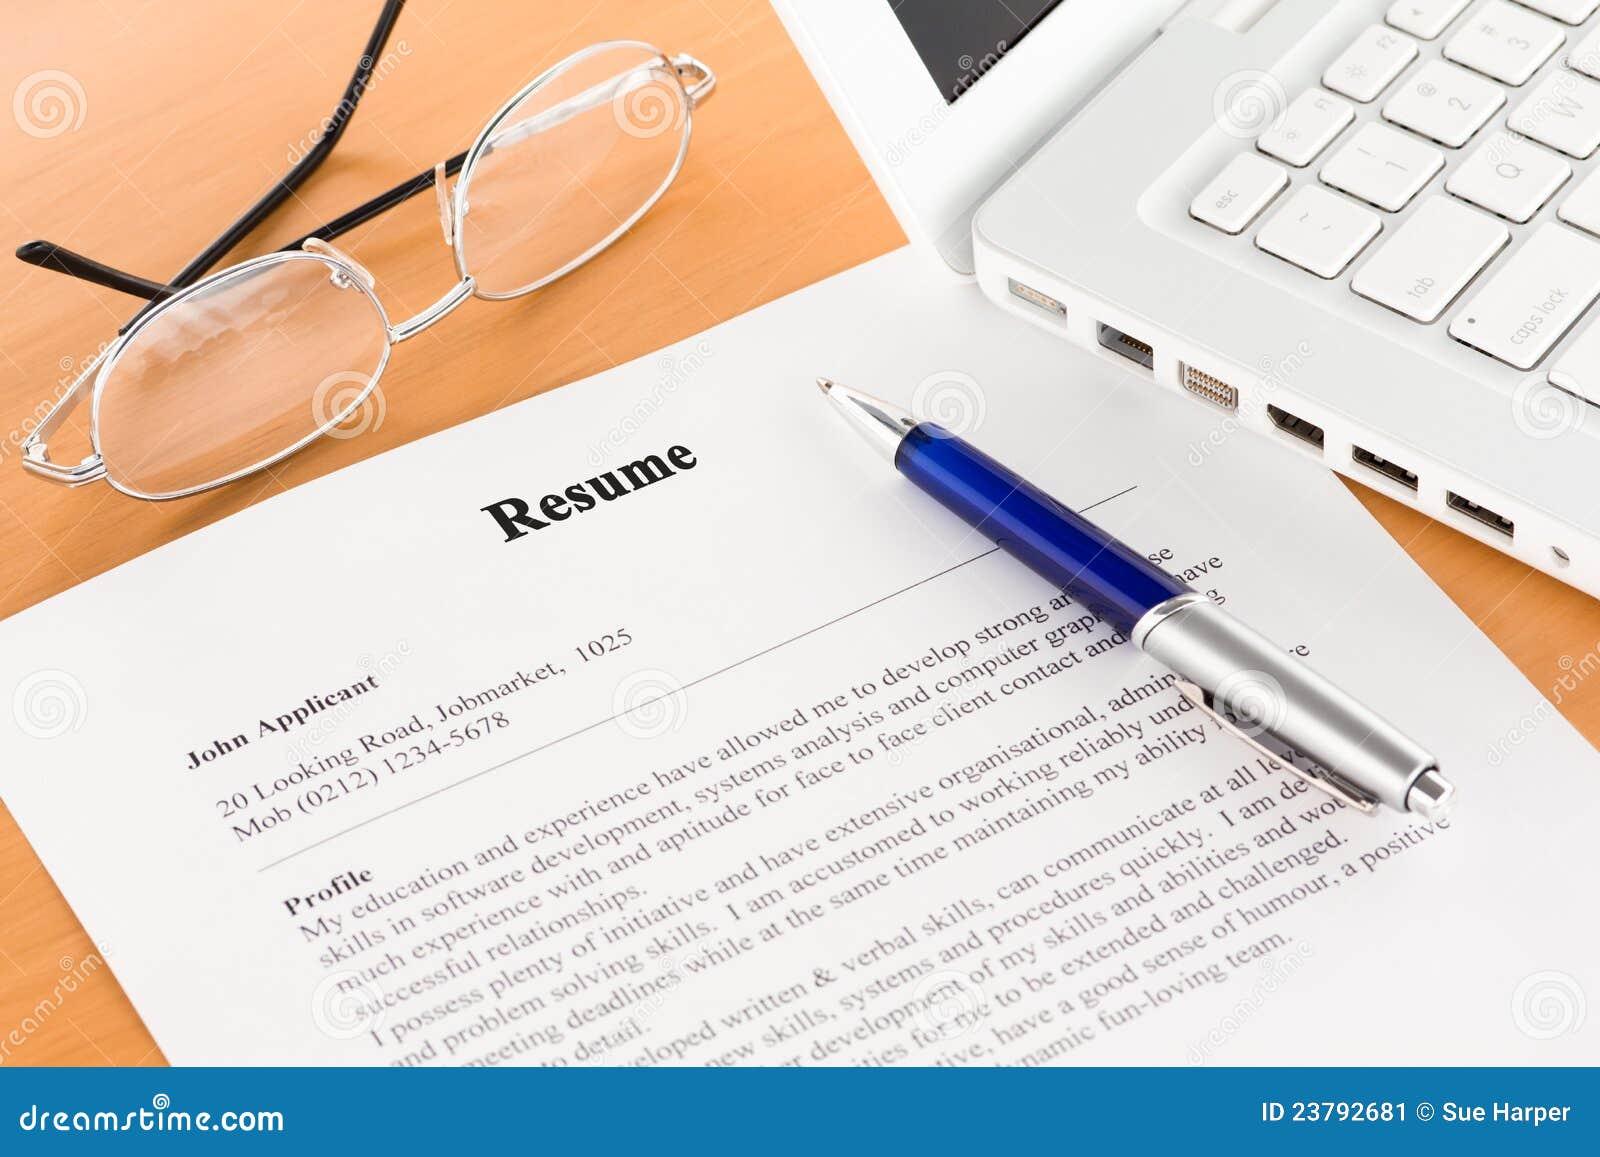 resume pen by laptop stock image image  resume pen by laptop